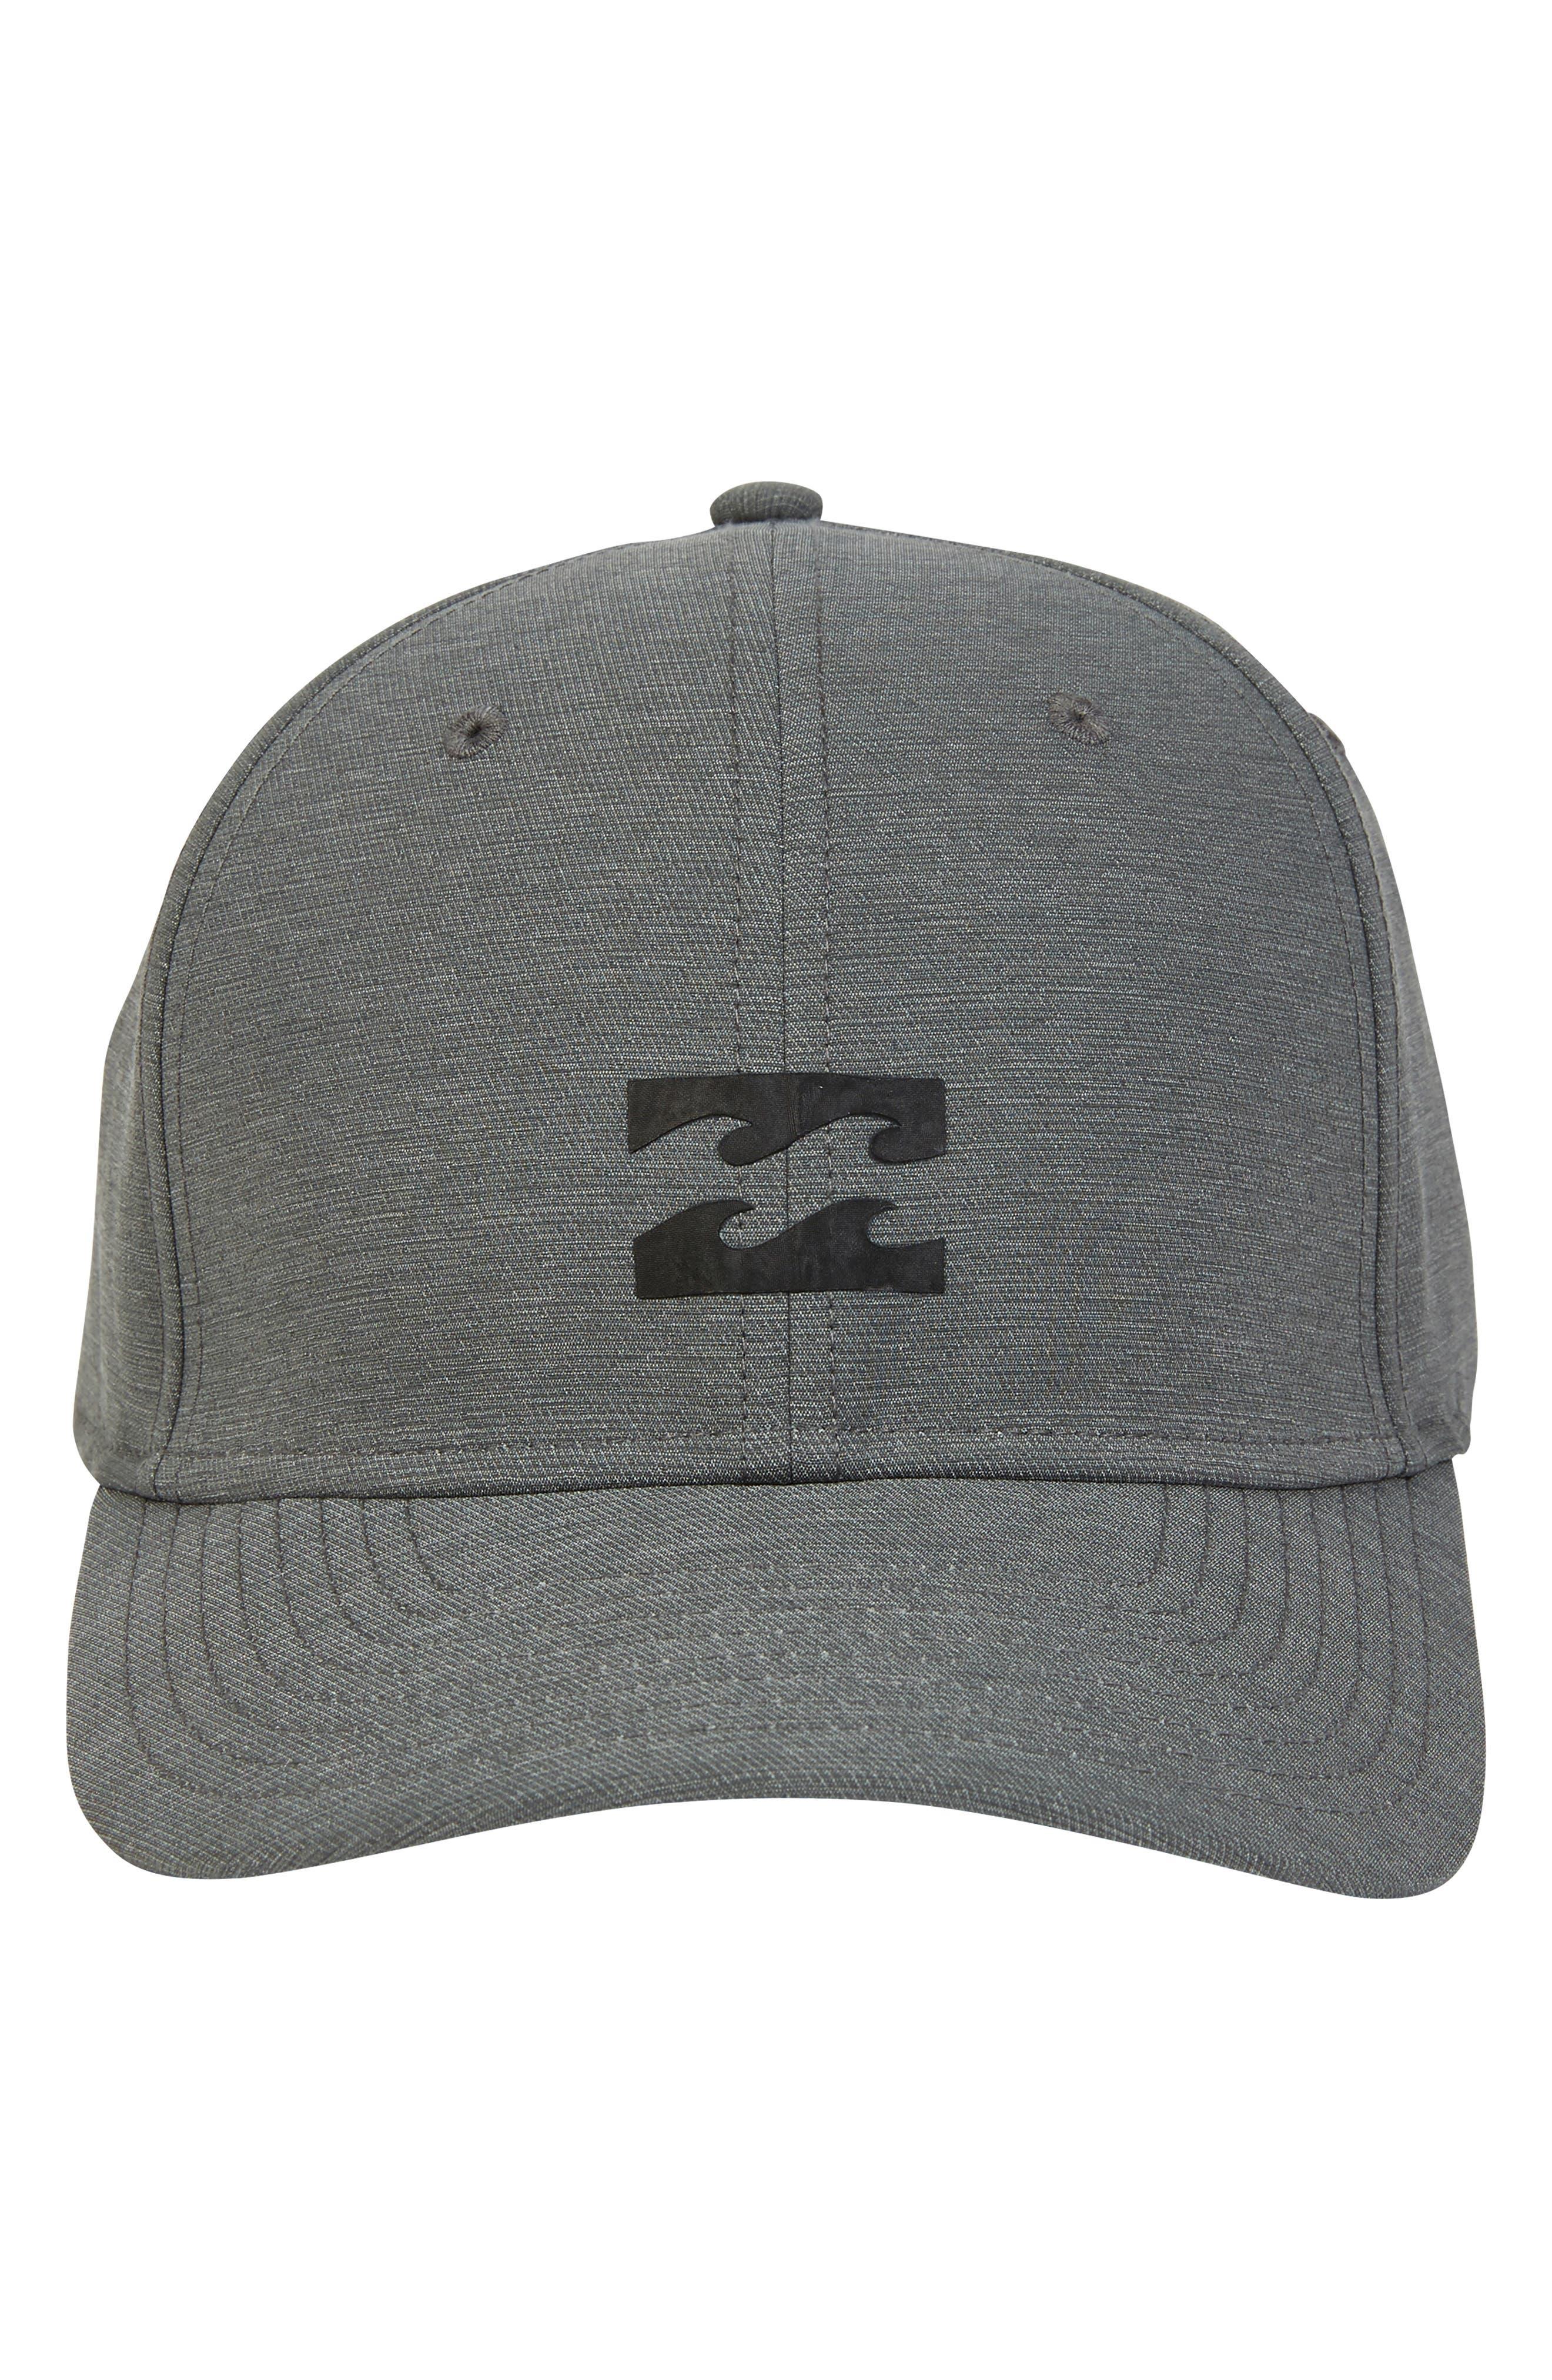 7f60730ded6f7 Grey Billabong Board Shorts   Clothing for Men